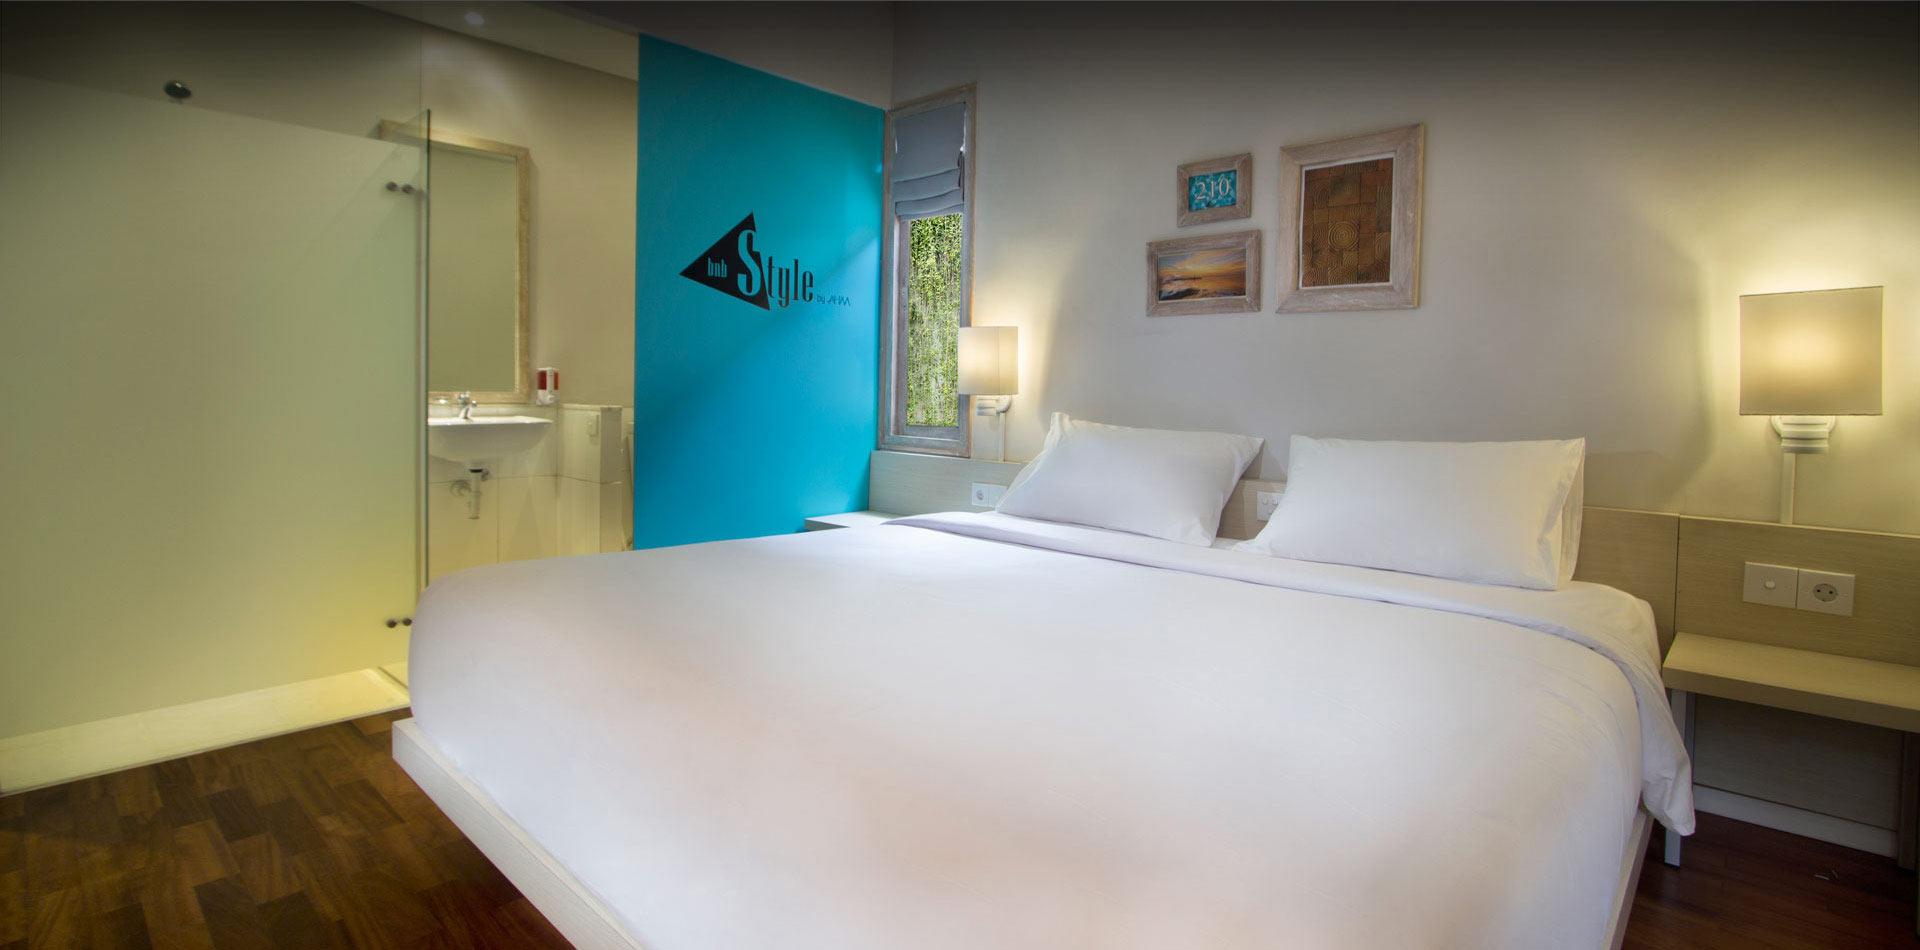 bnb style hotel room